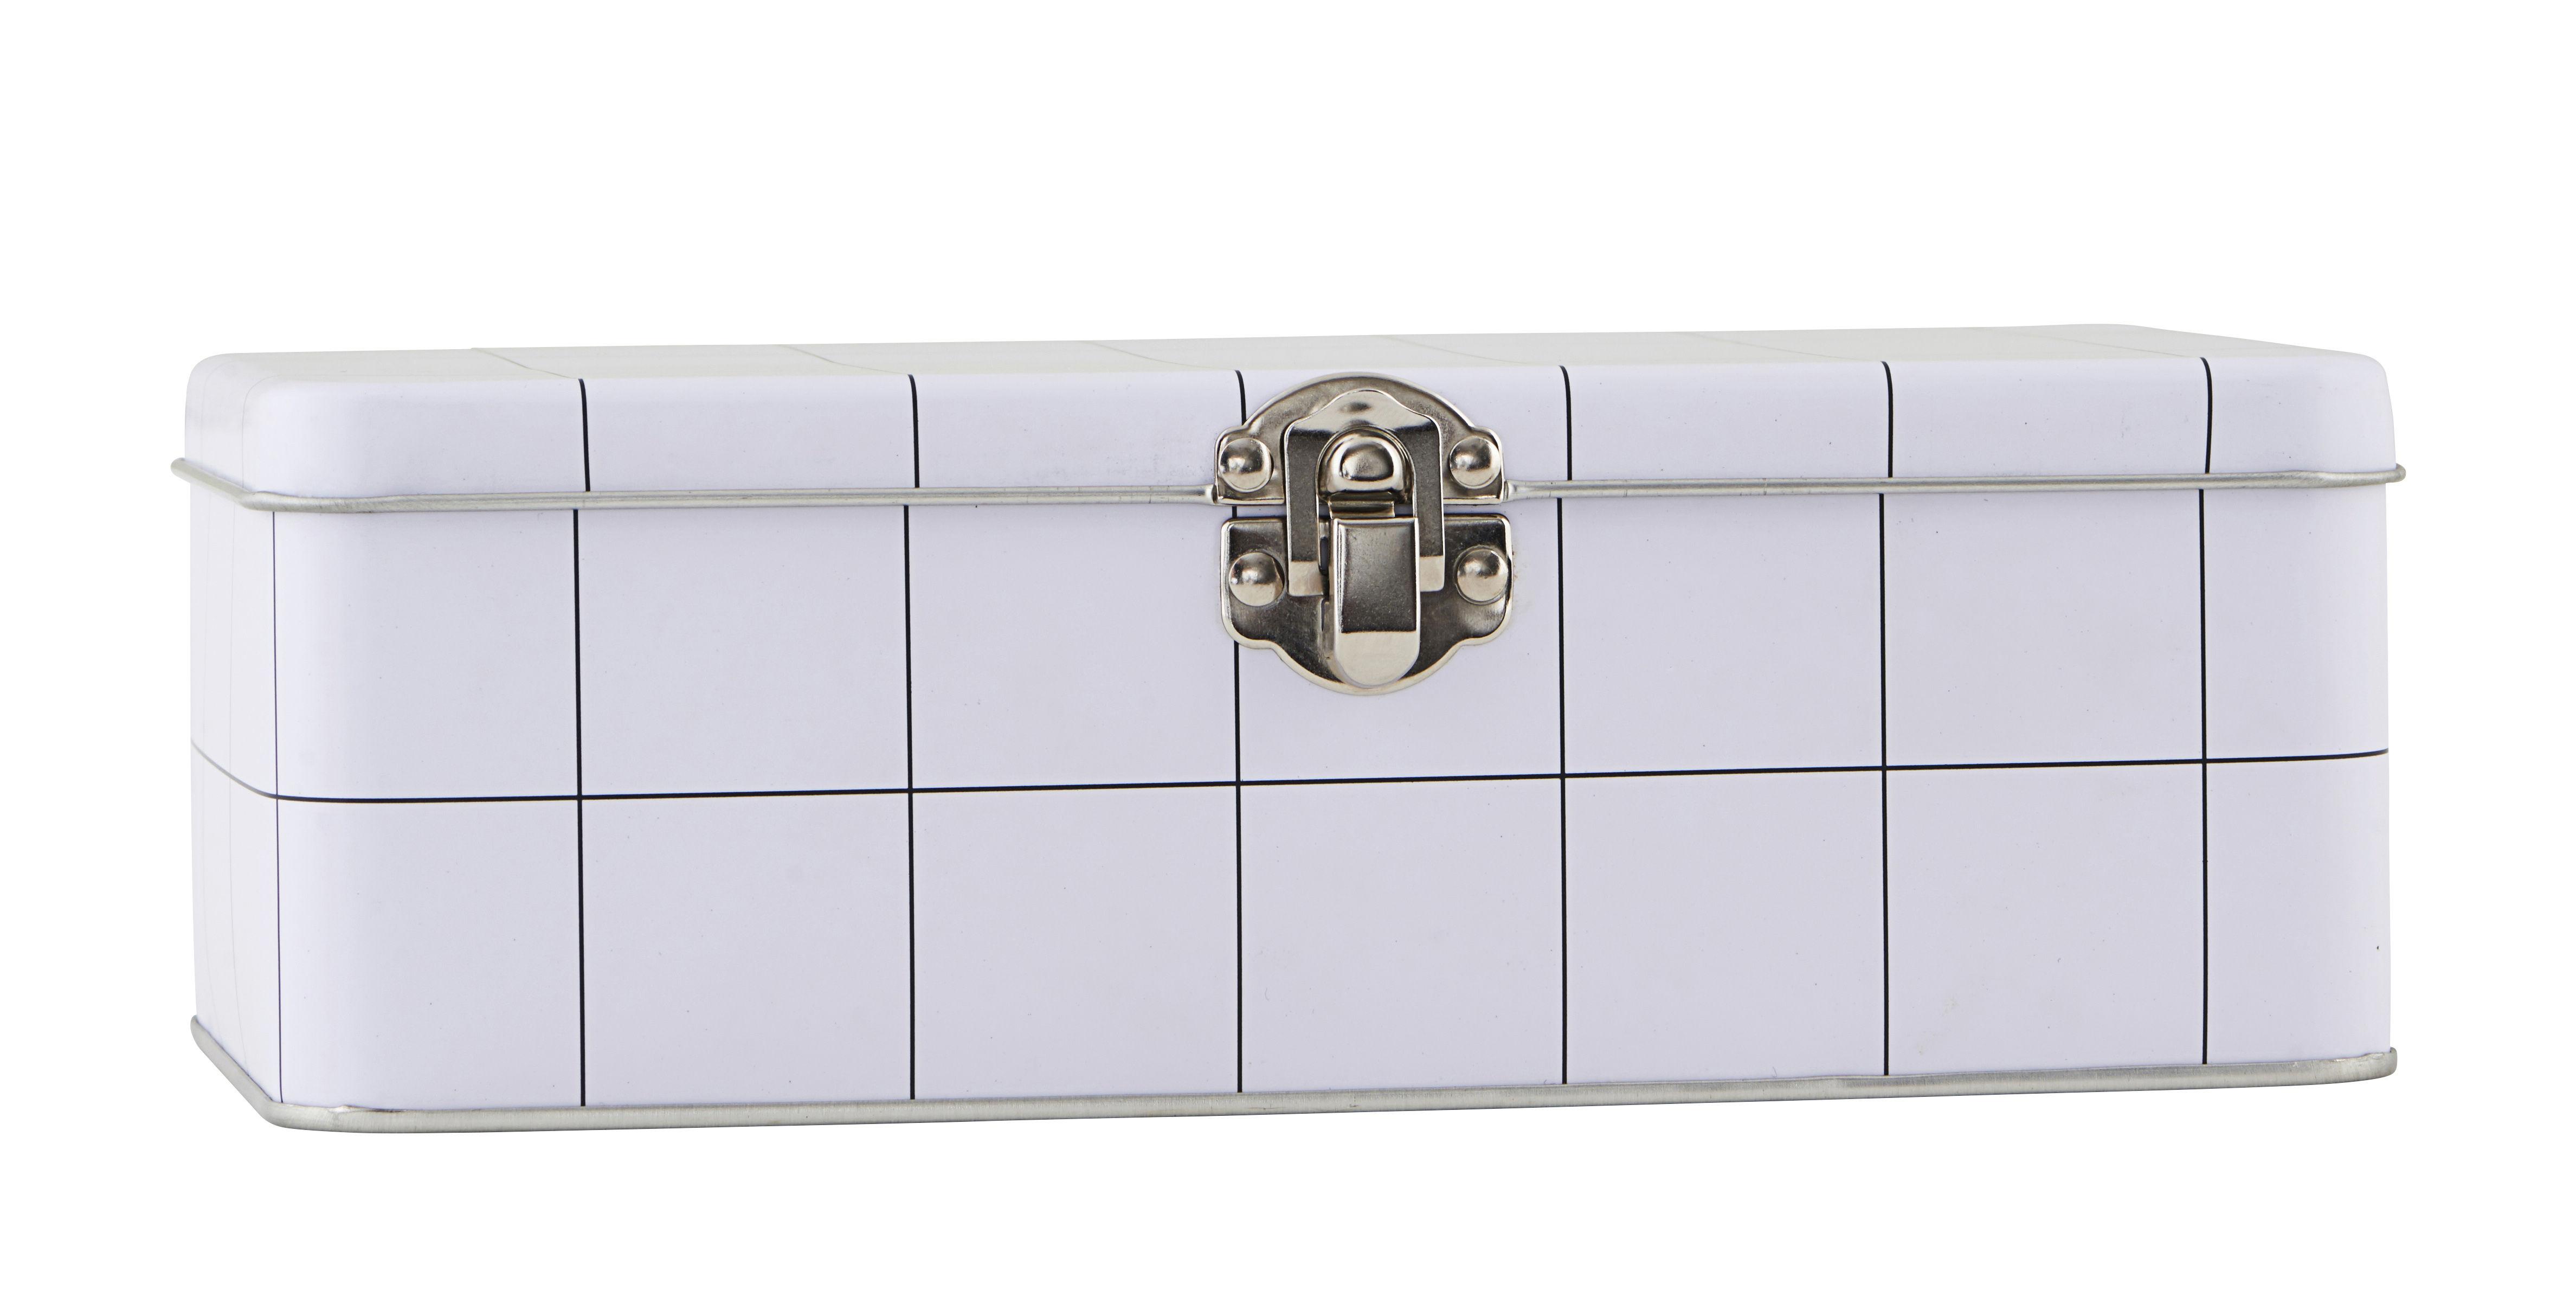 bo te lunch box graph 01 lignes vertes house doctor. Black Bedroom Furniture Sets. Home Design Ideas